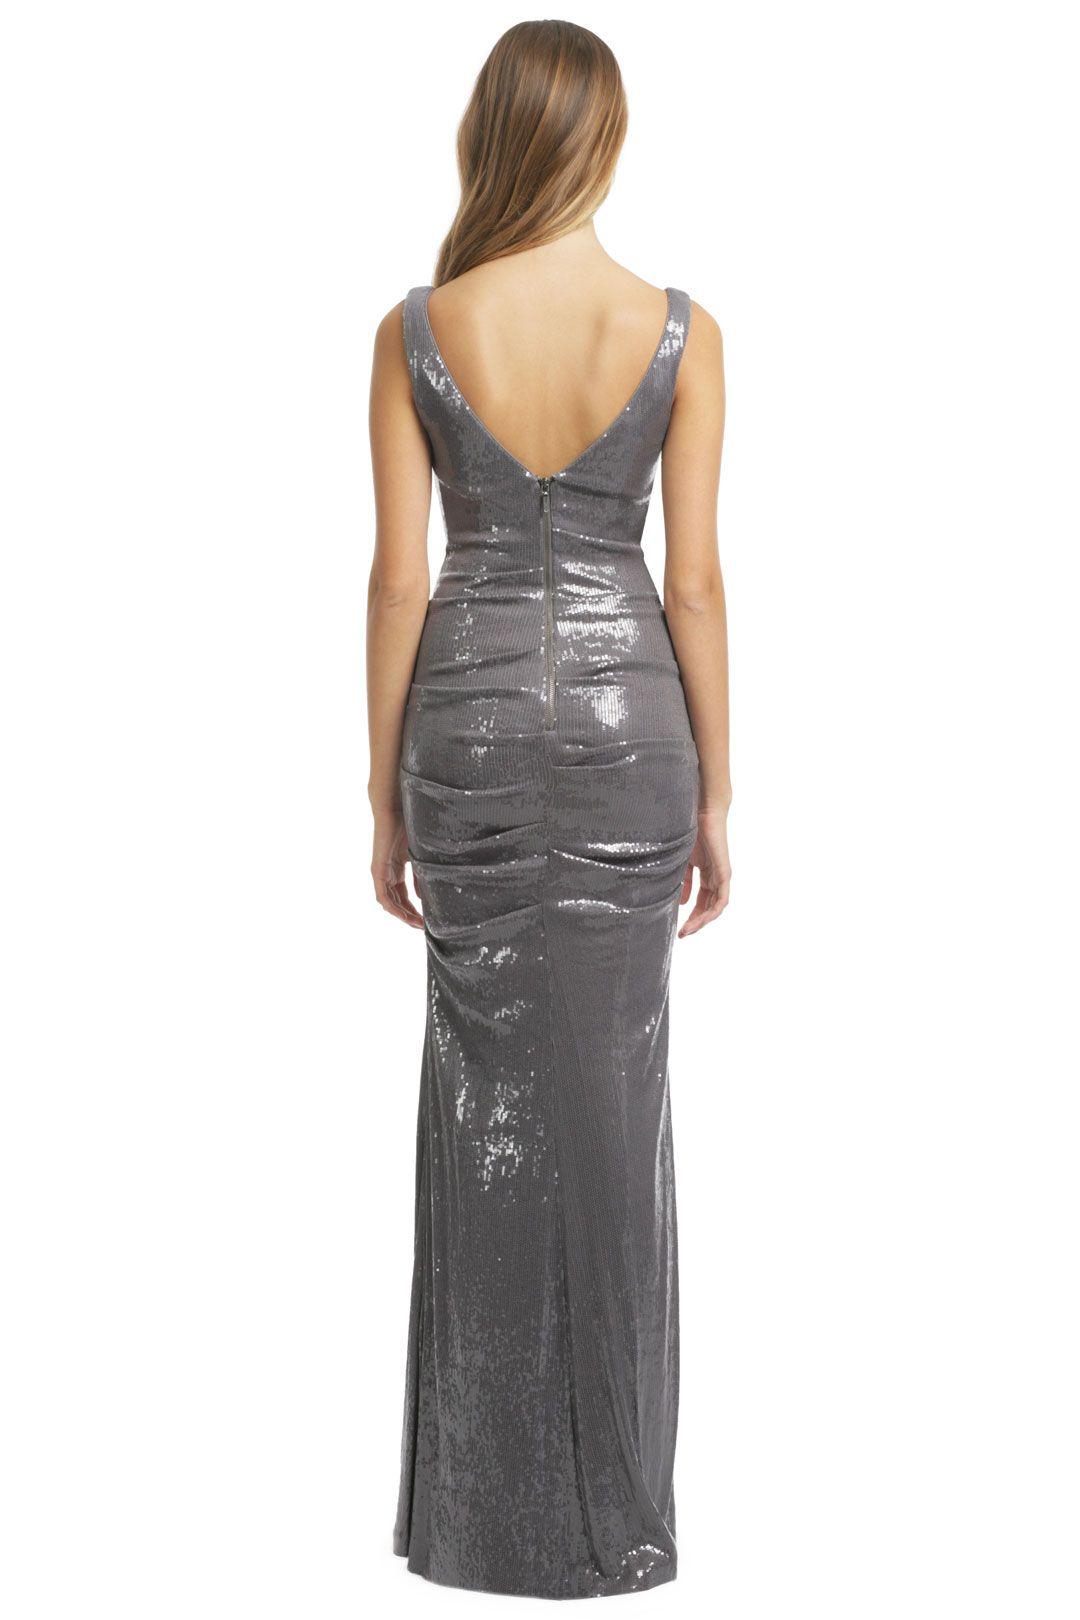 Arctic mist gown by nicole miller back designer dresses